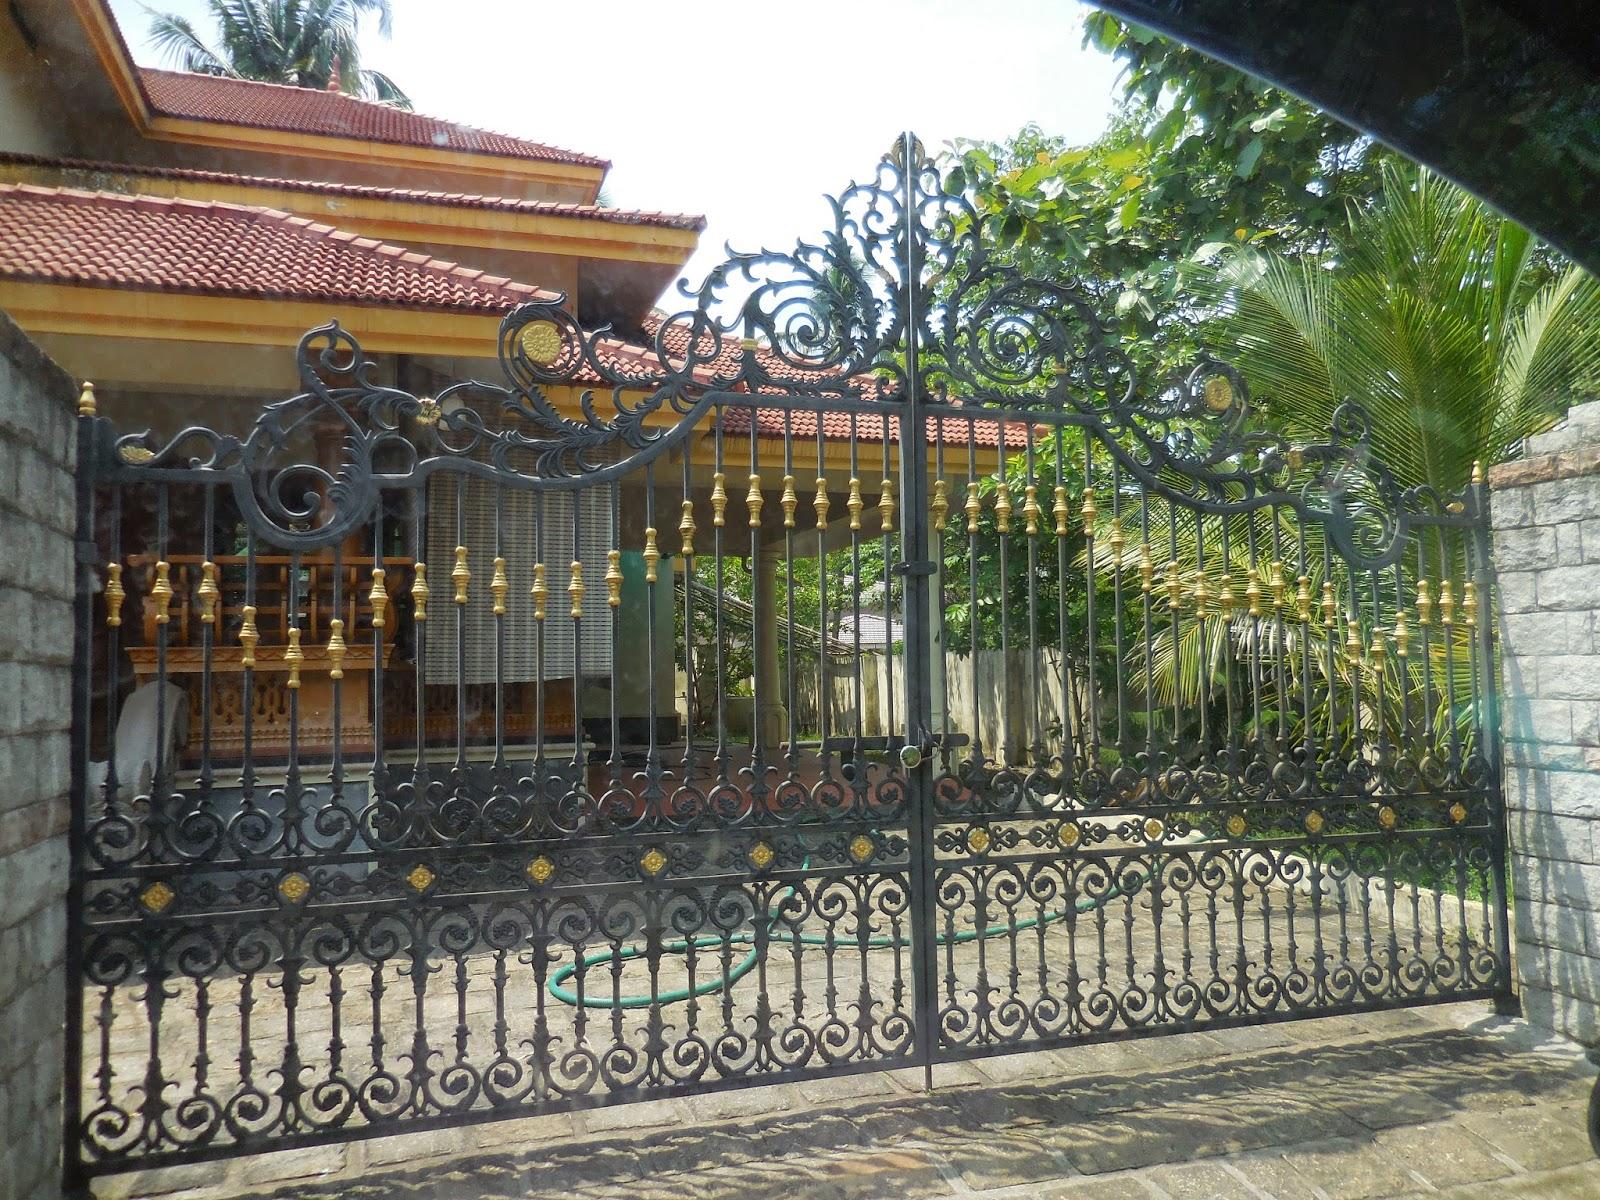 Kerala Gate Designs: Houses gates in Thrissur District, Kerala